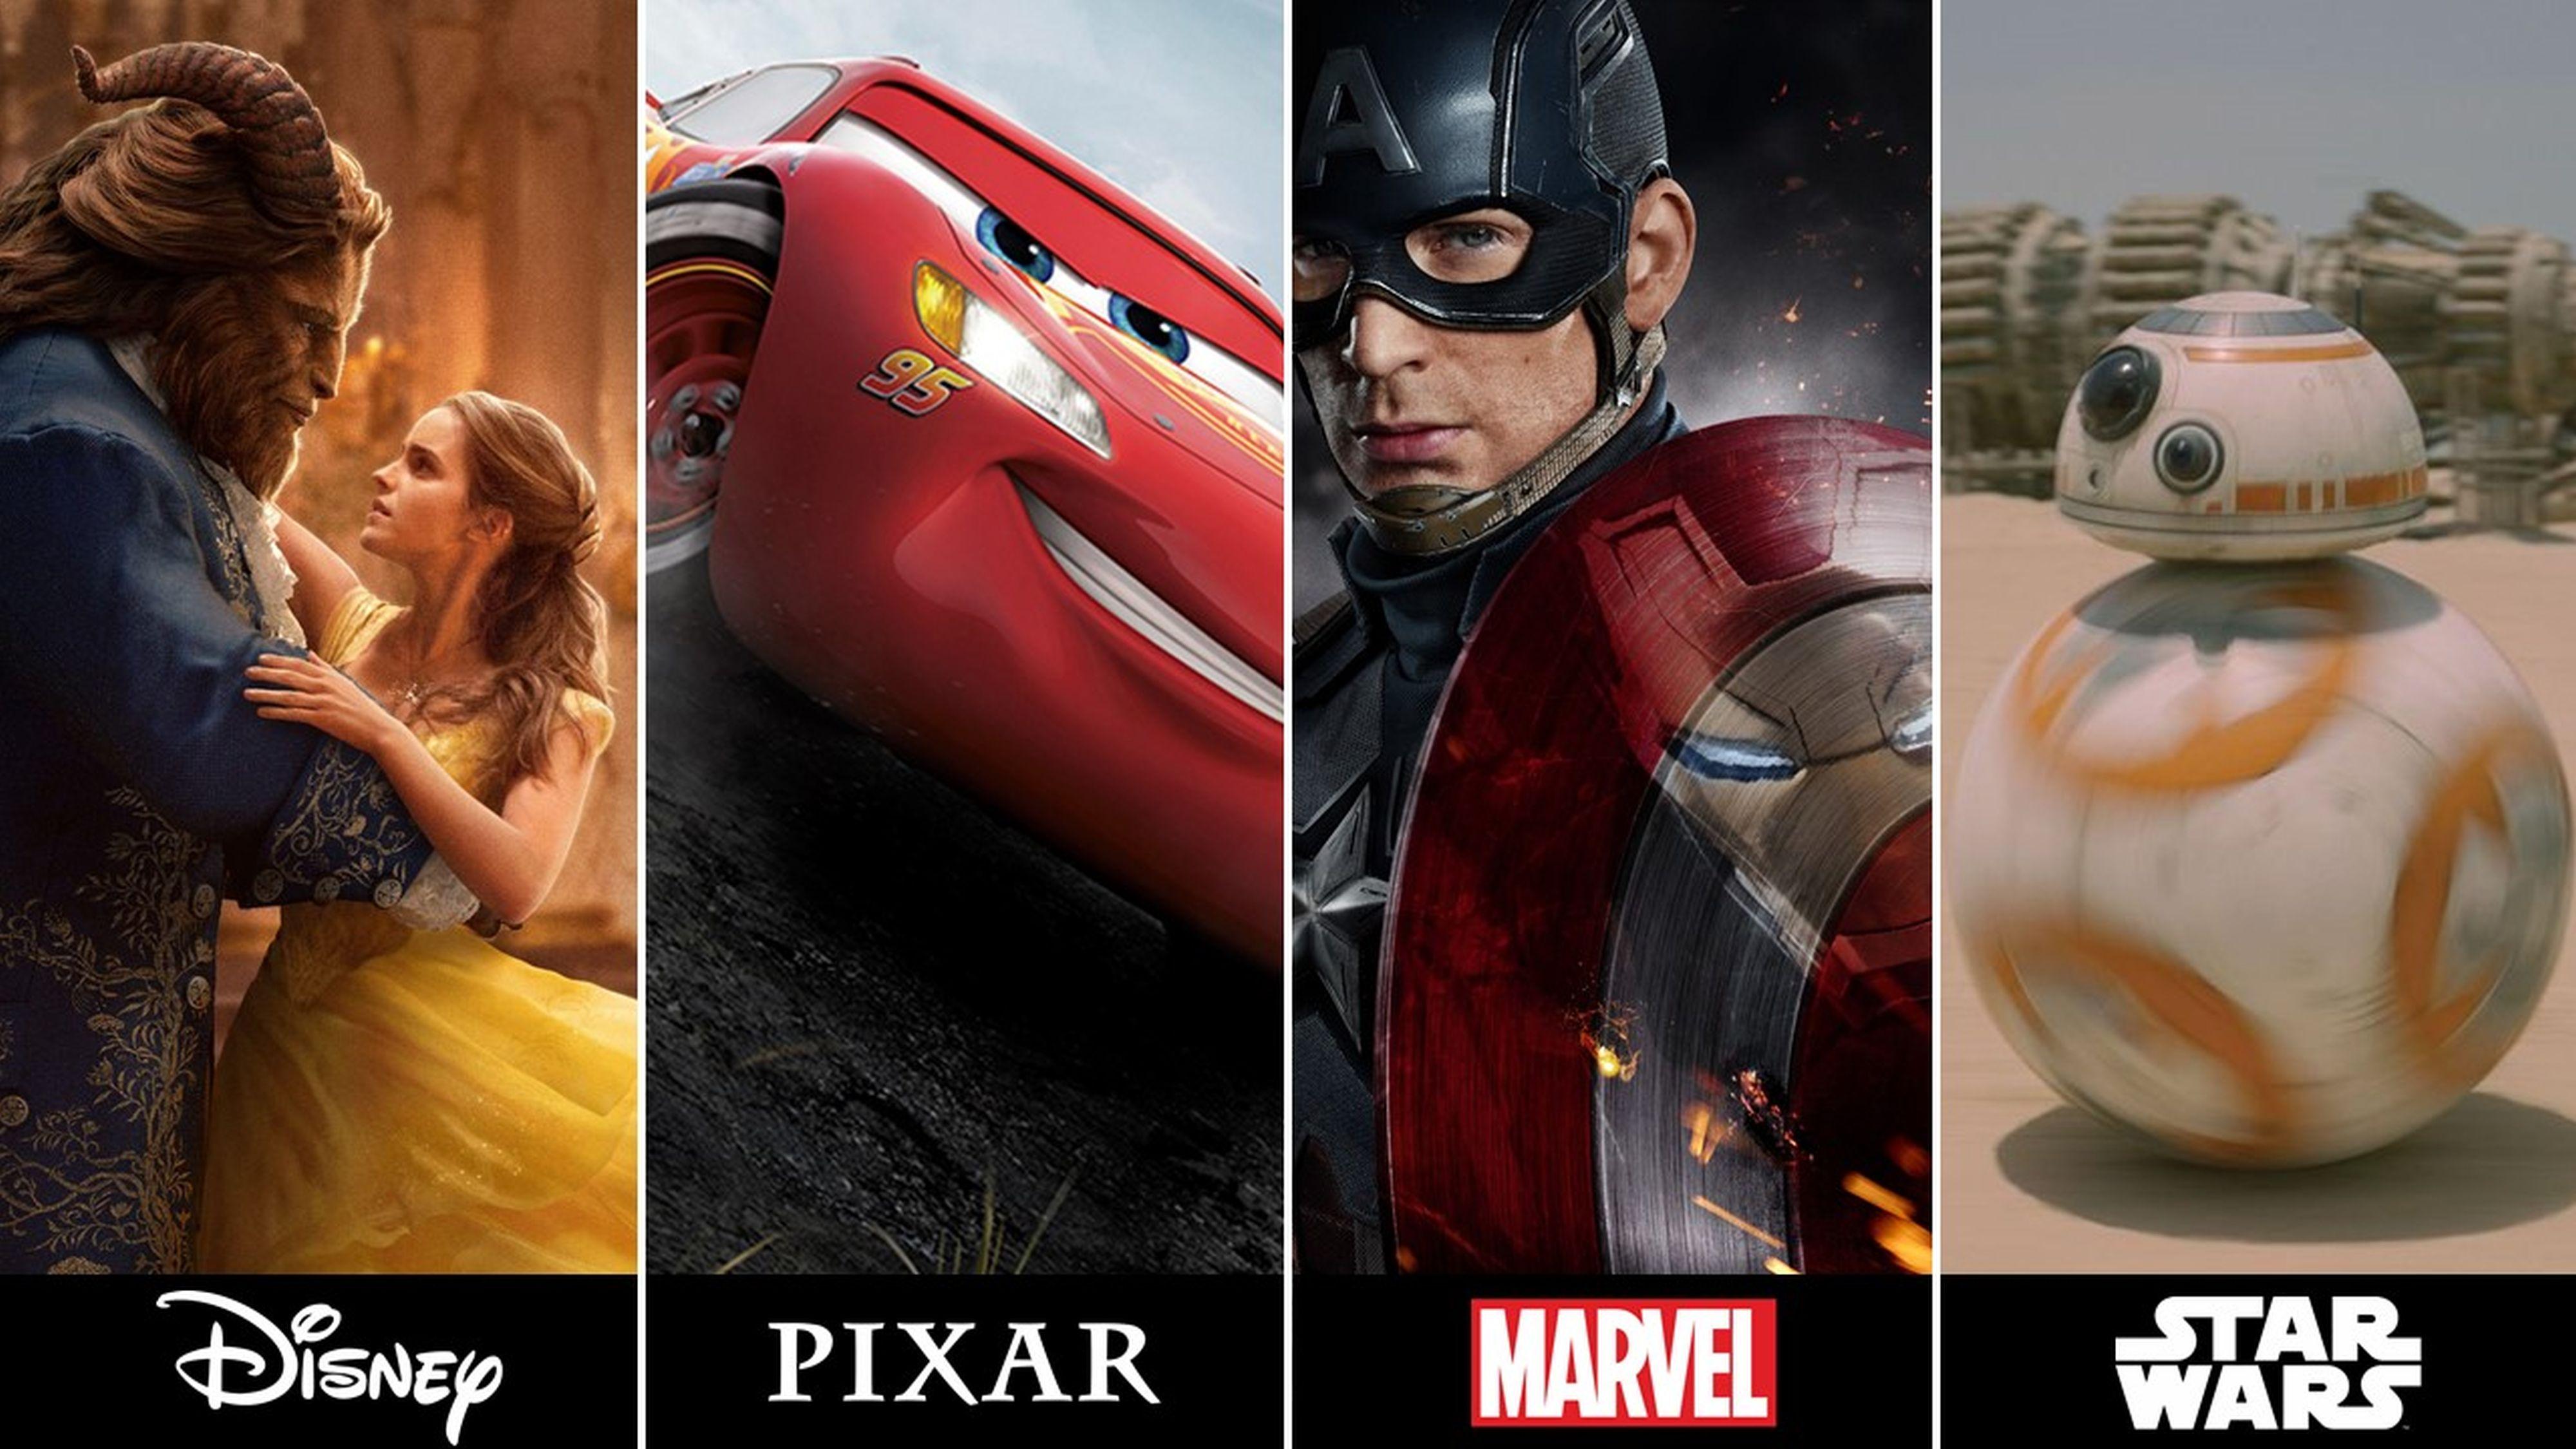 BrandLoyalty in partnership con Disney, Star Wars, Pixar e Marvel